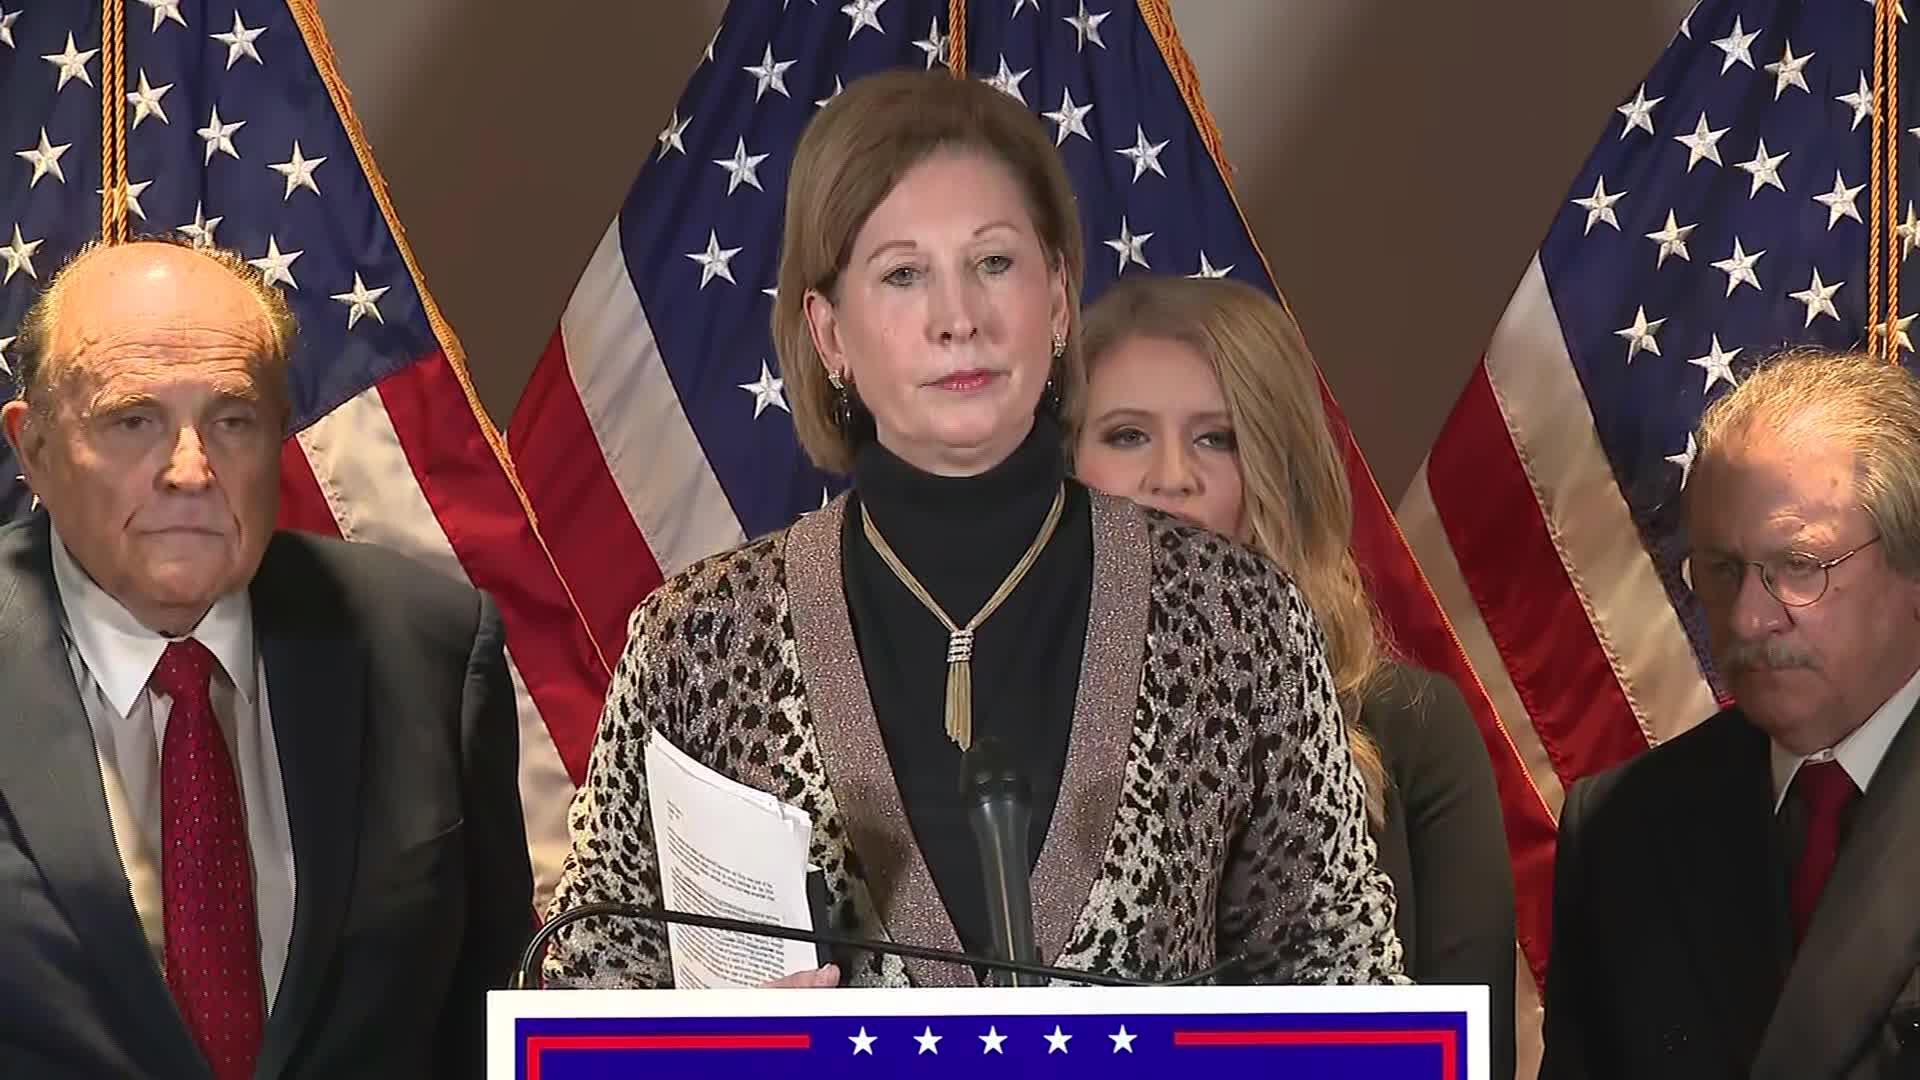 Judge sanctions pro-Trump lawyers who brought 'frivolous' election fraud lawsuits